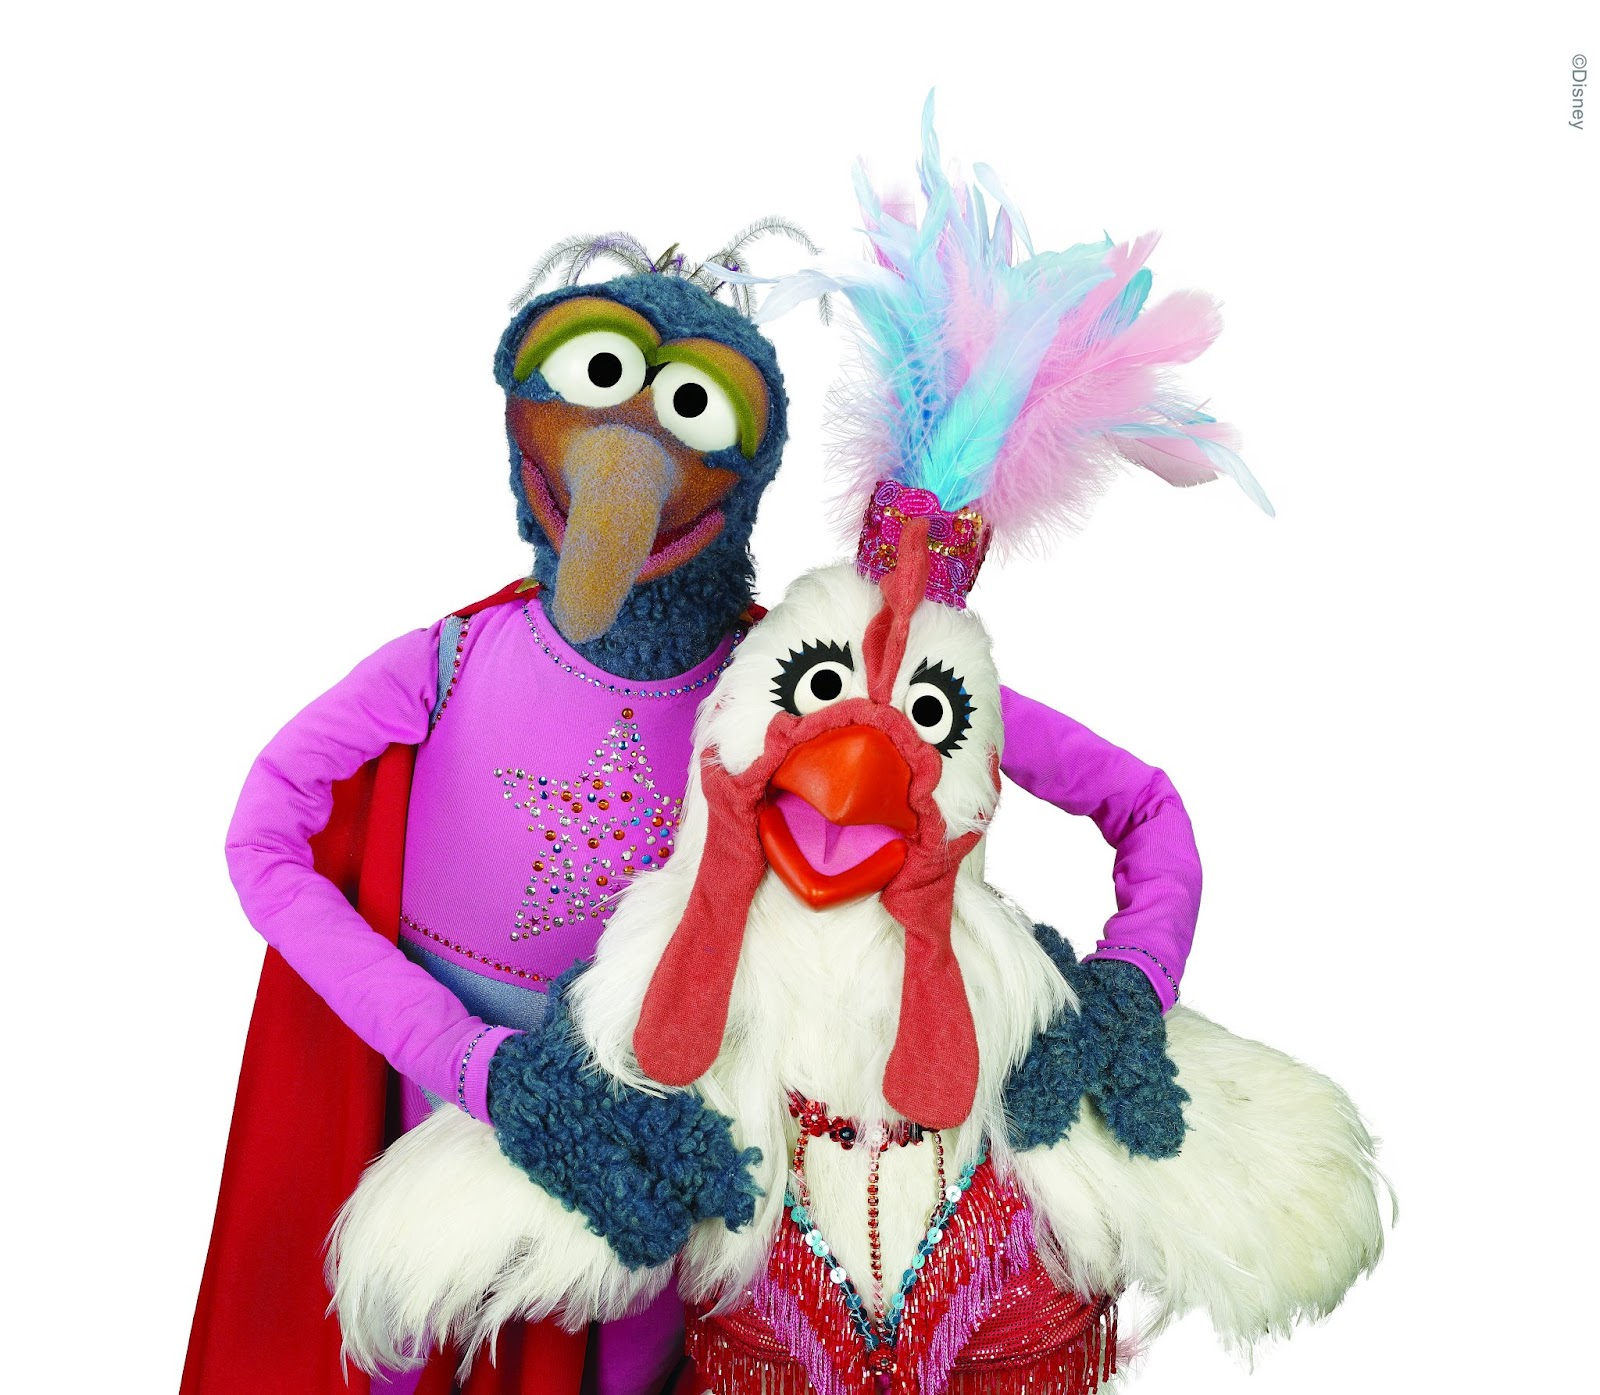 Muppet Quotes Muppetquotes: Gonzo Muppet Quotes. QuotesGram